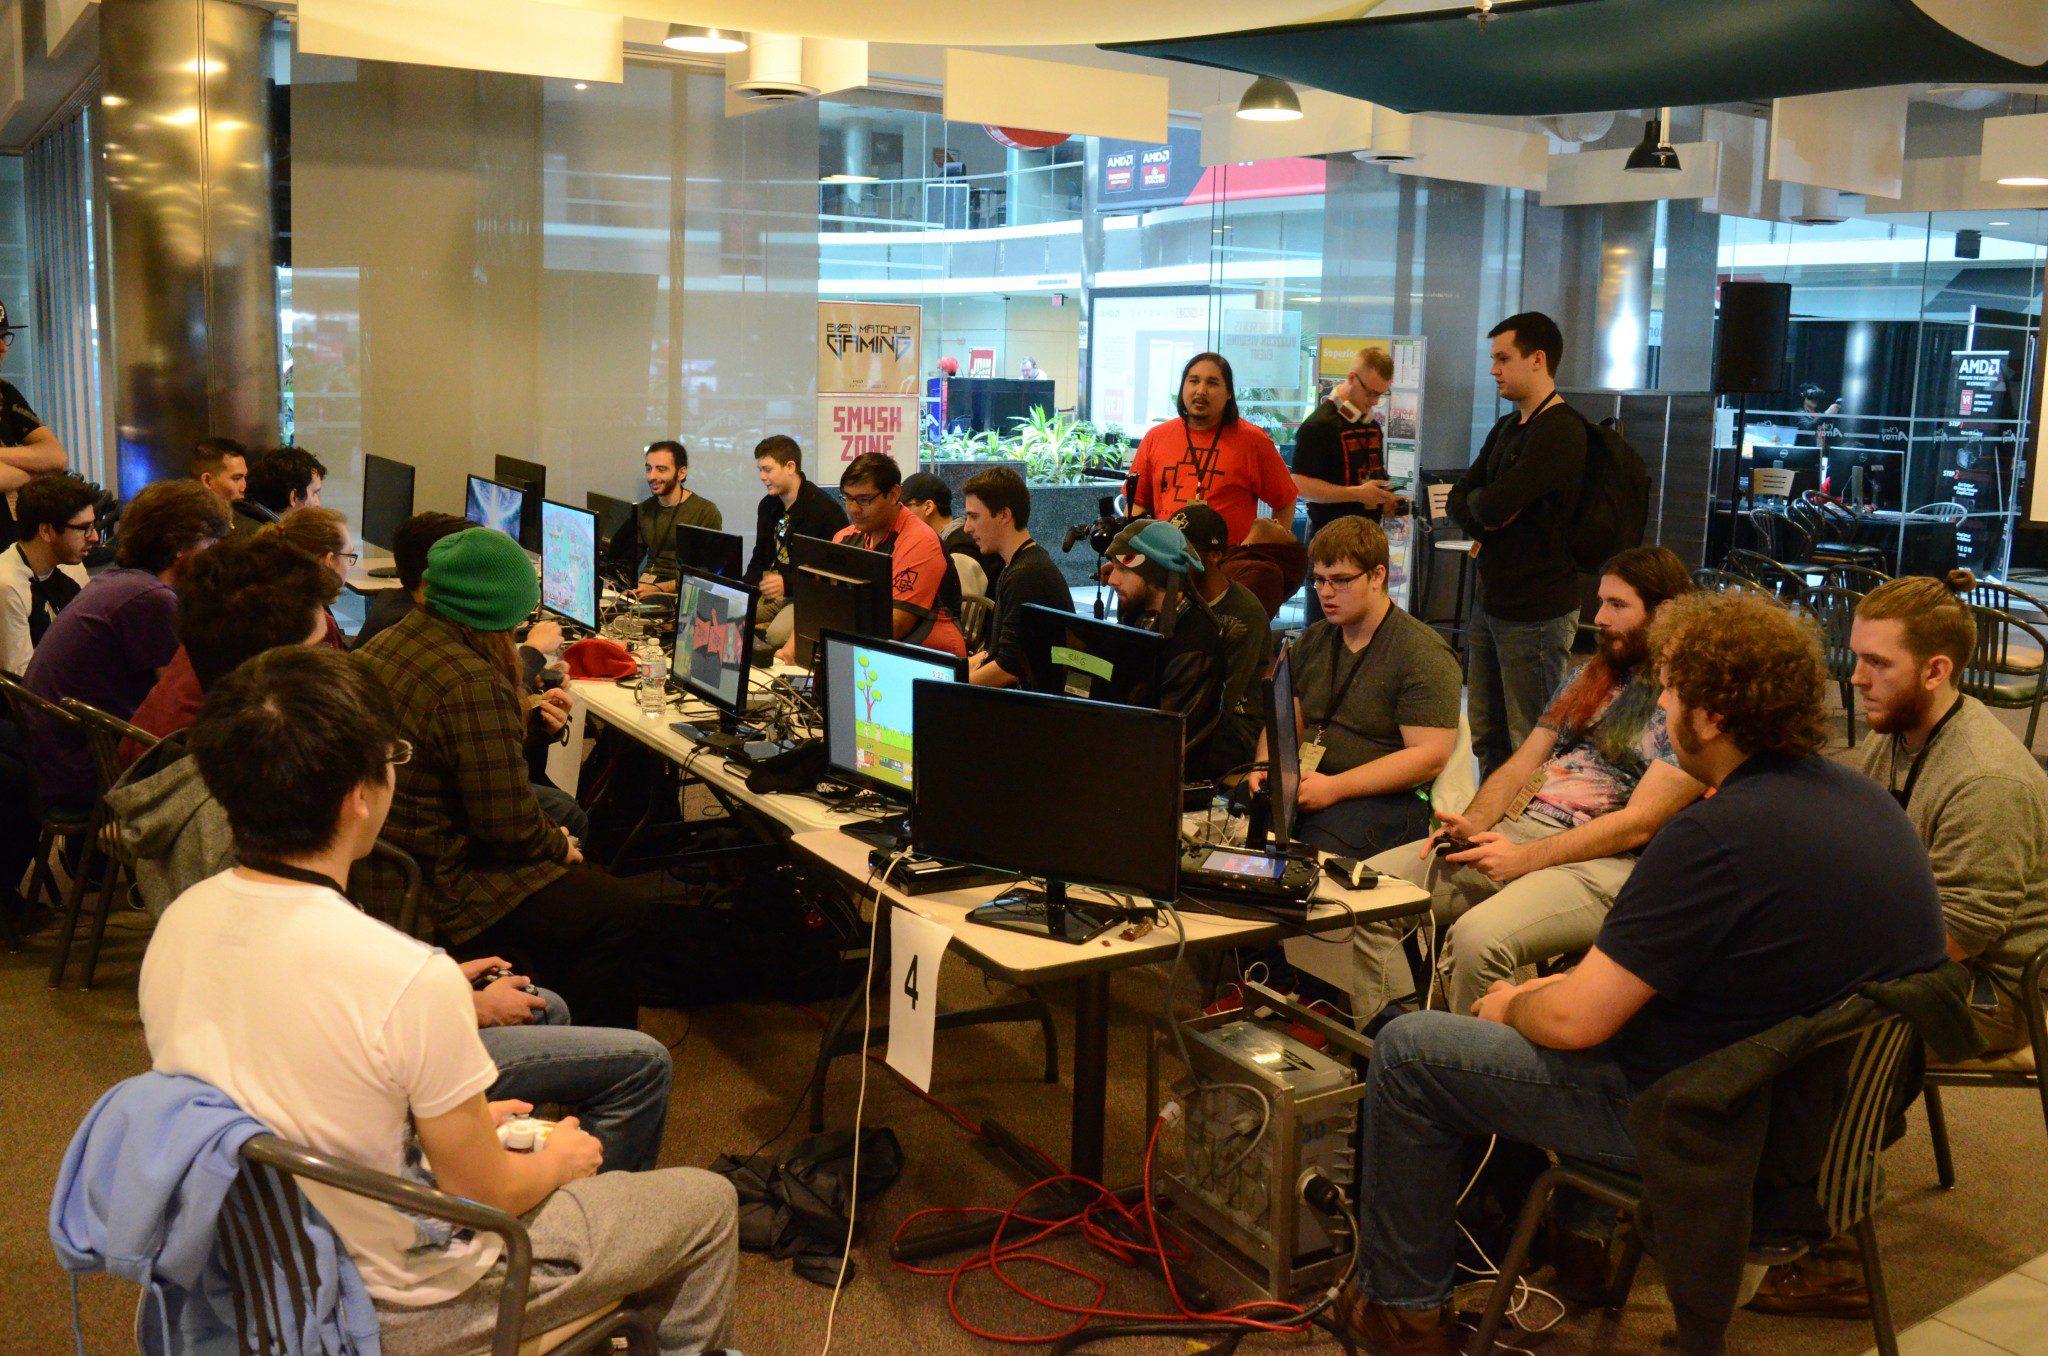 room full of video gamers